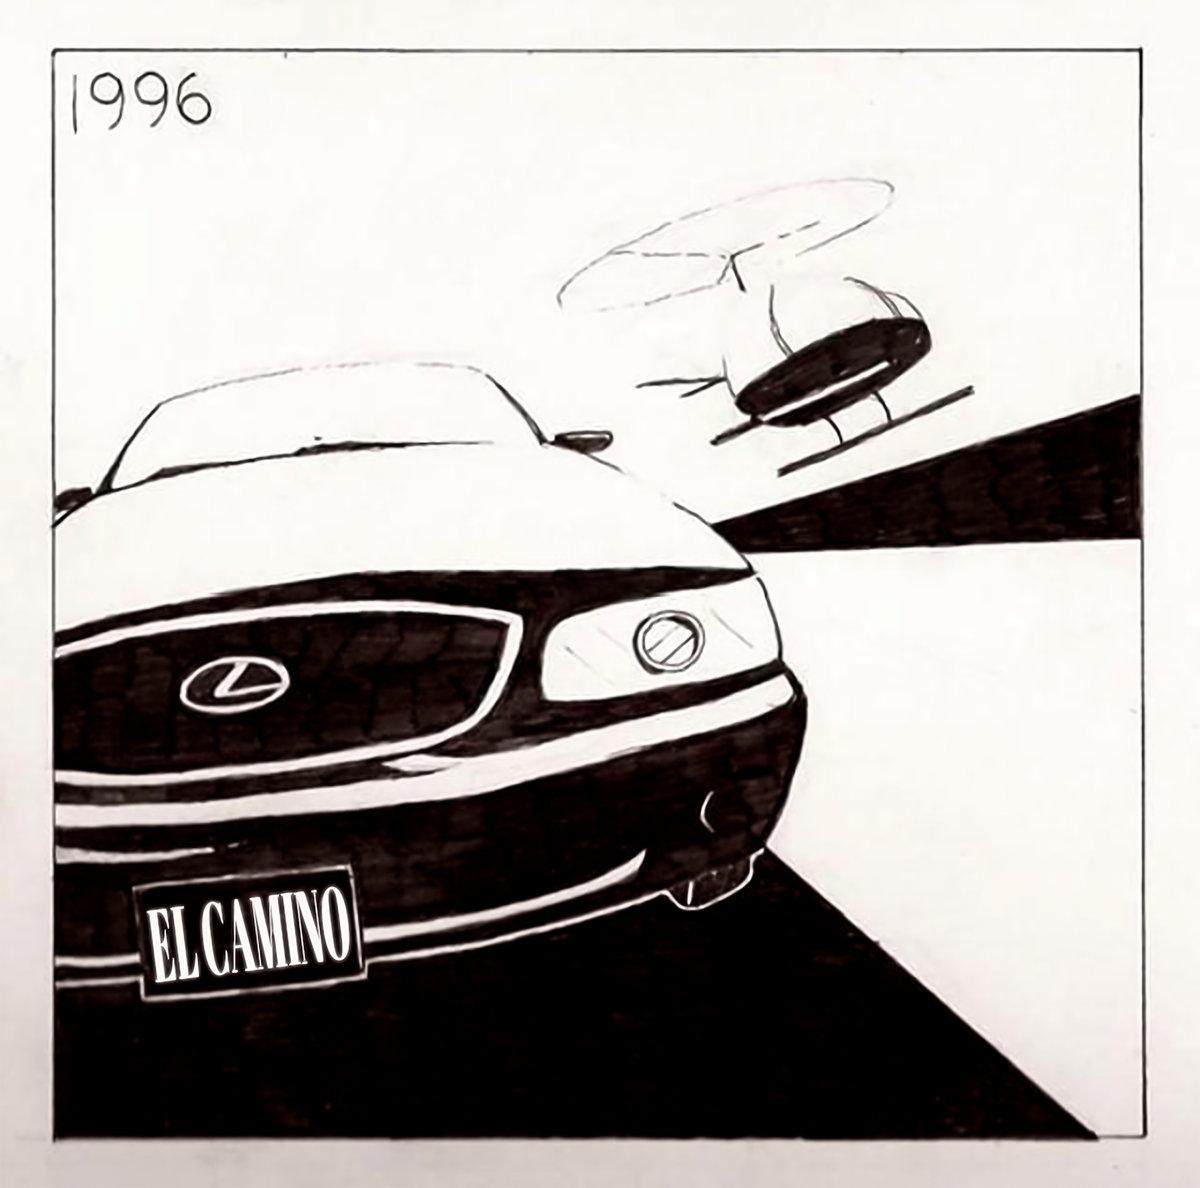 Elcamino_96